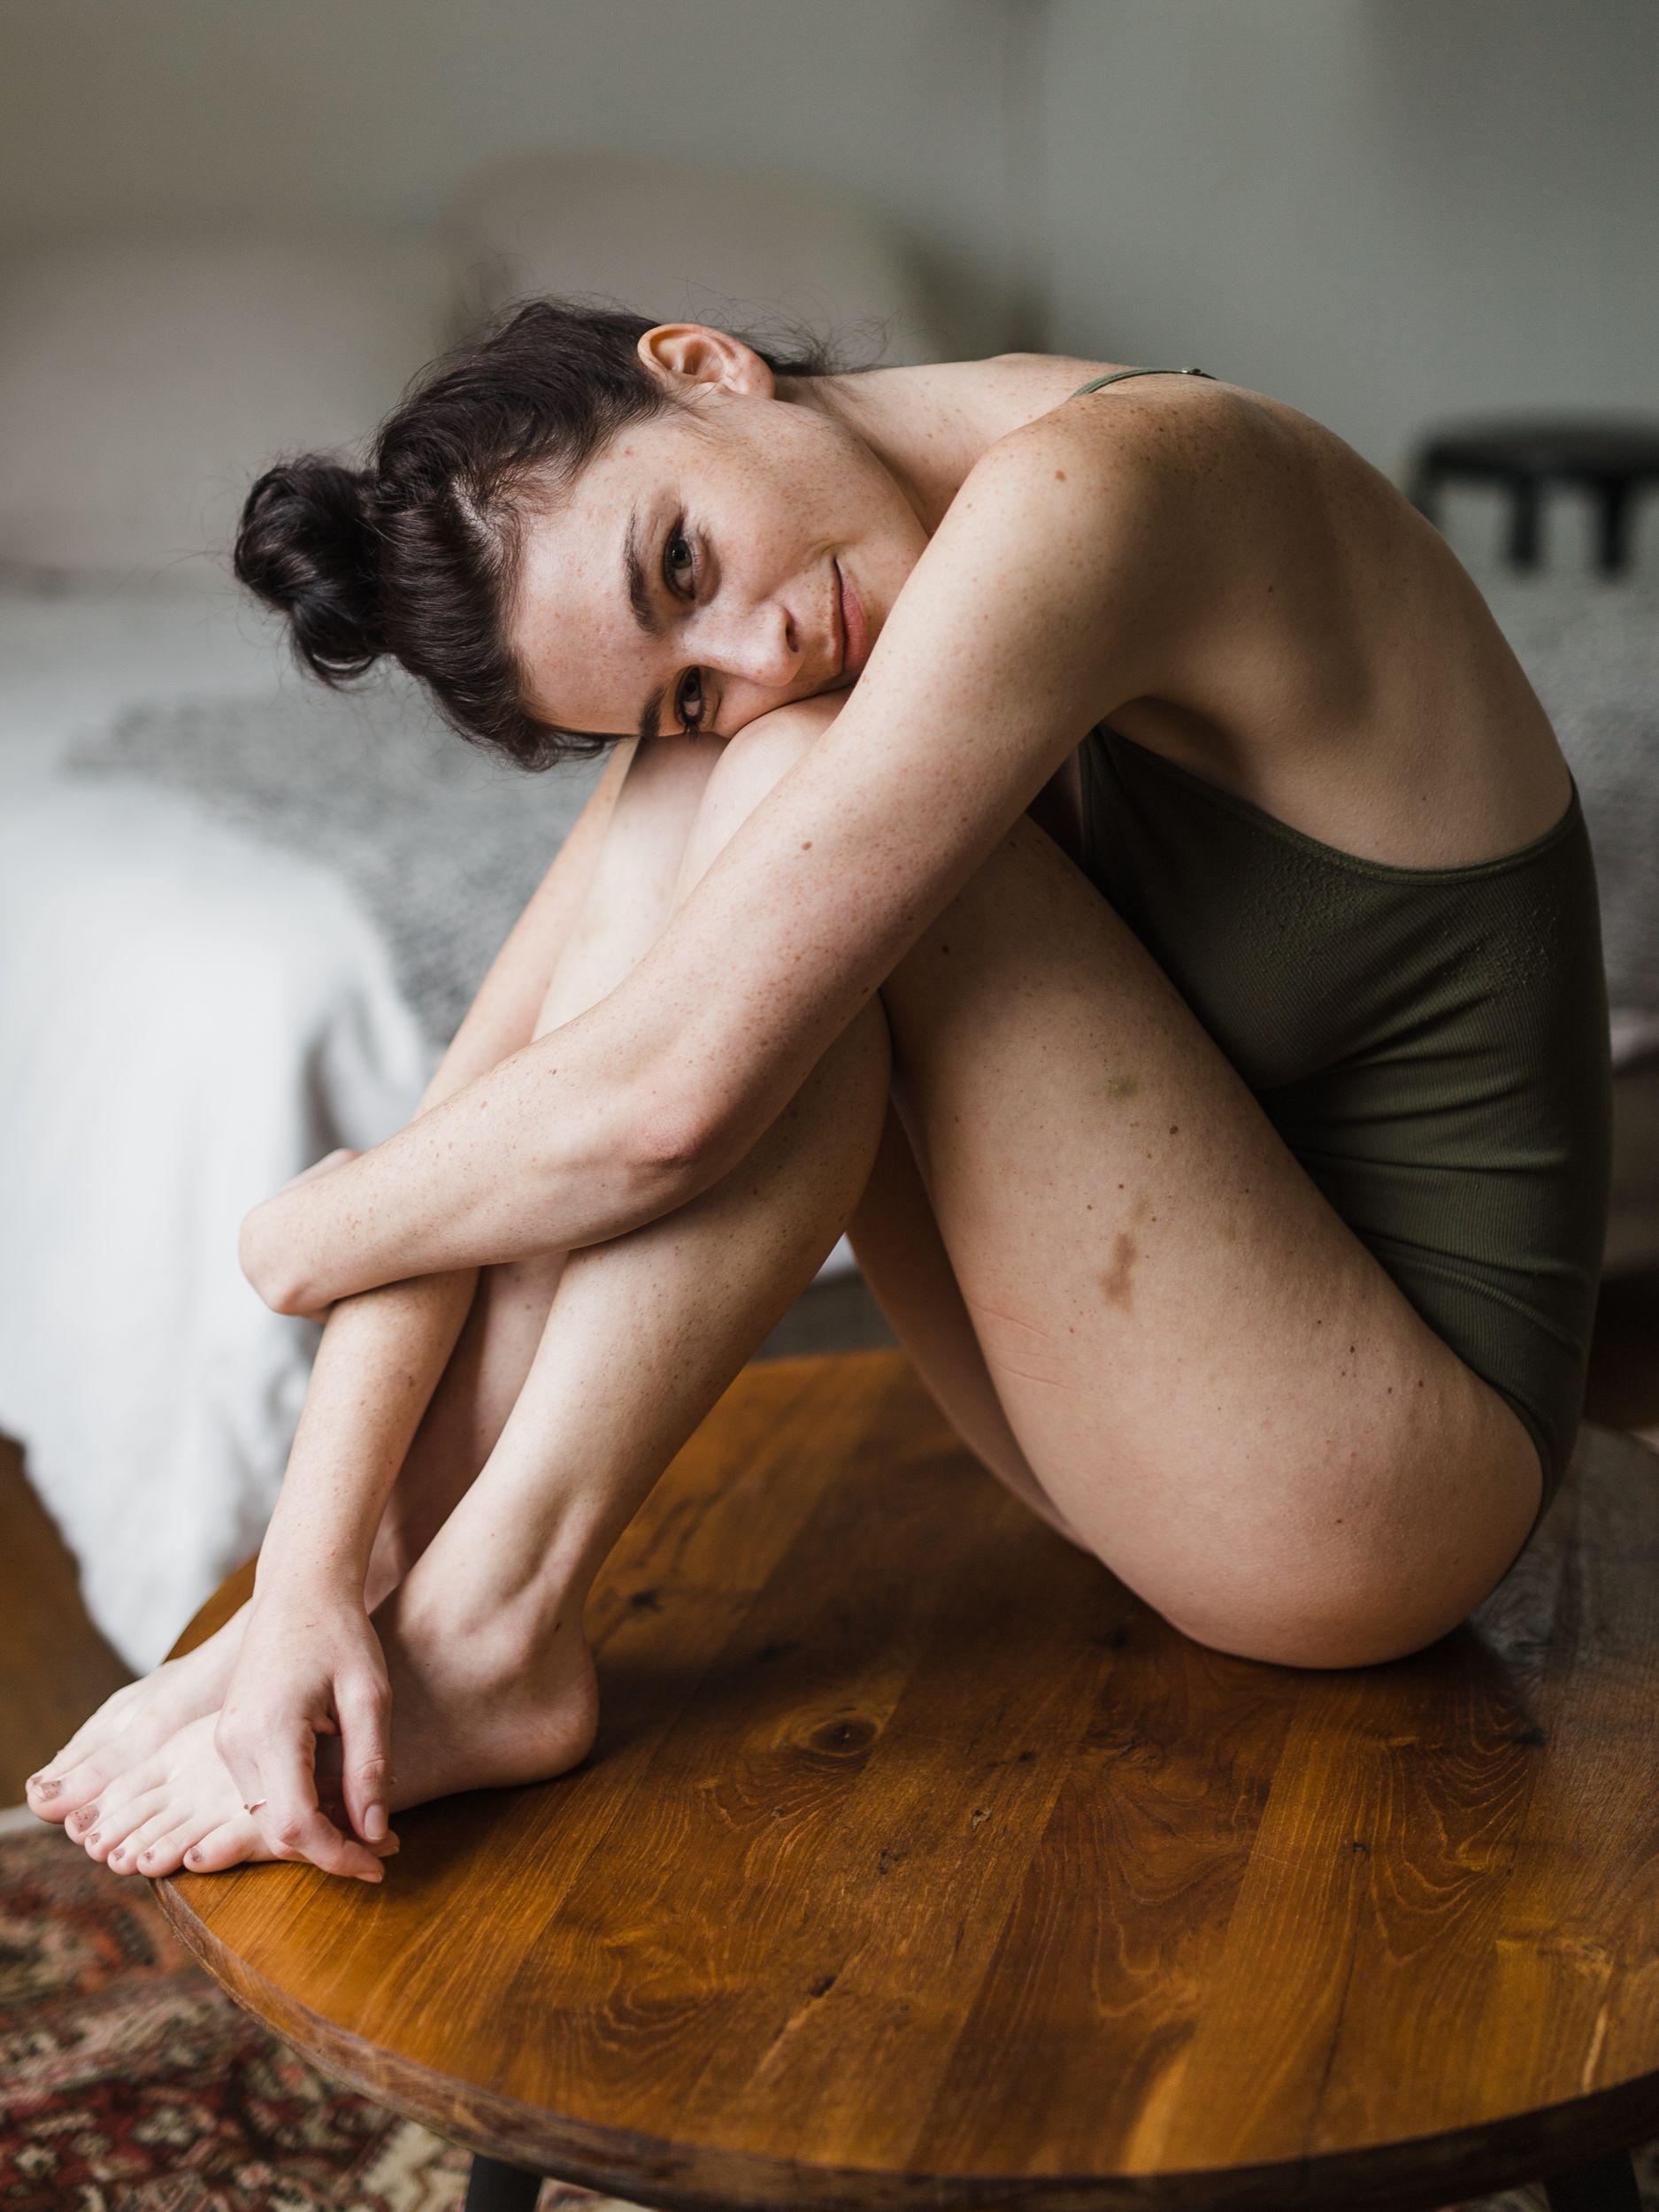 Paparazzi Chloe Howcroft nudes (52 photo), Sexy, Hot, Feet, butt 2006